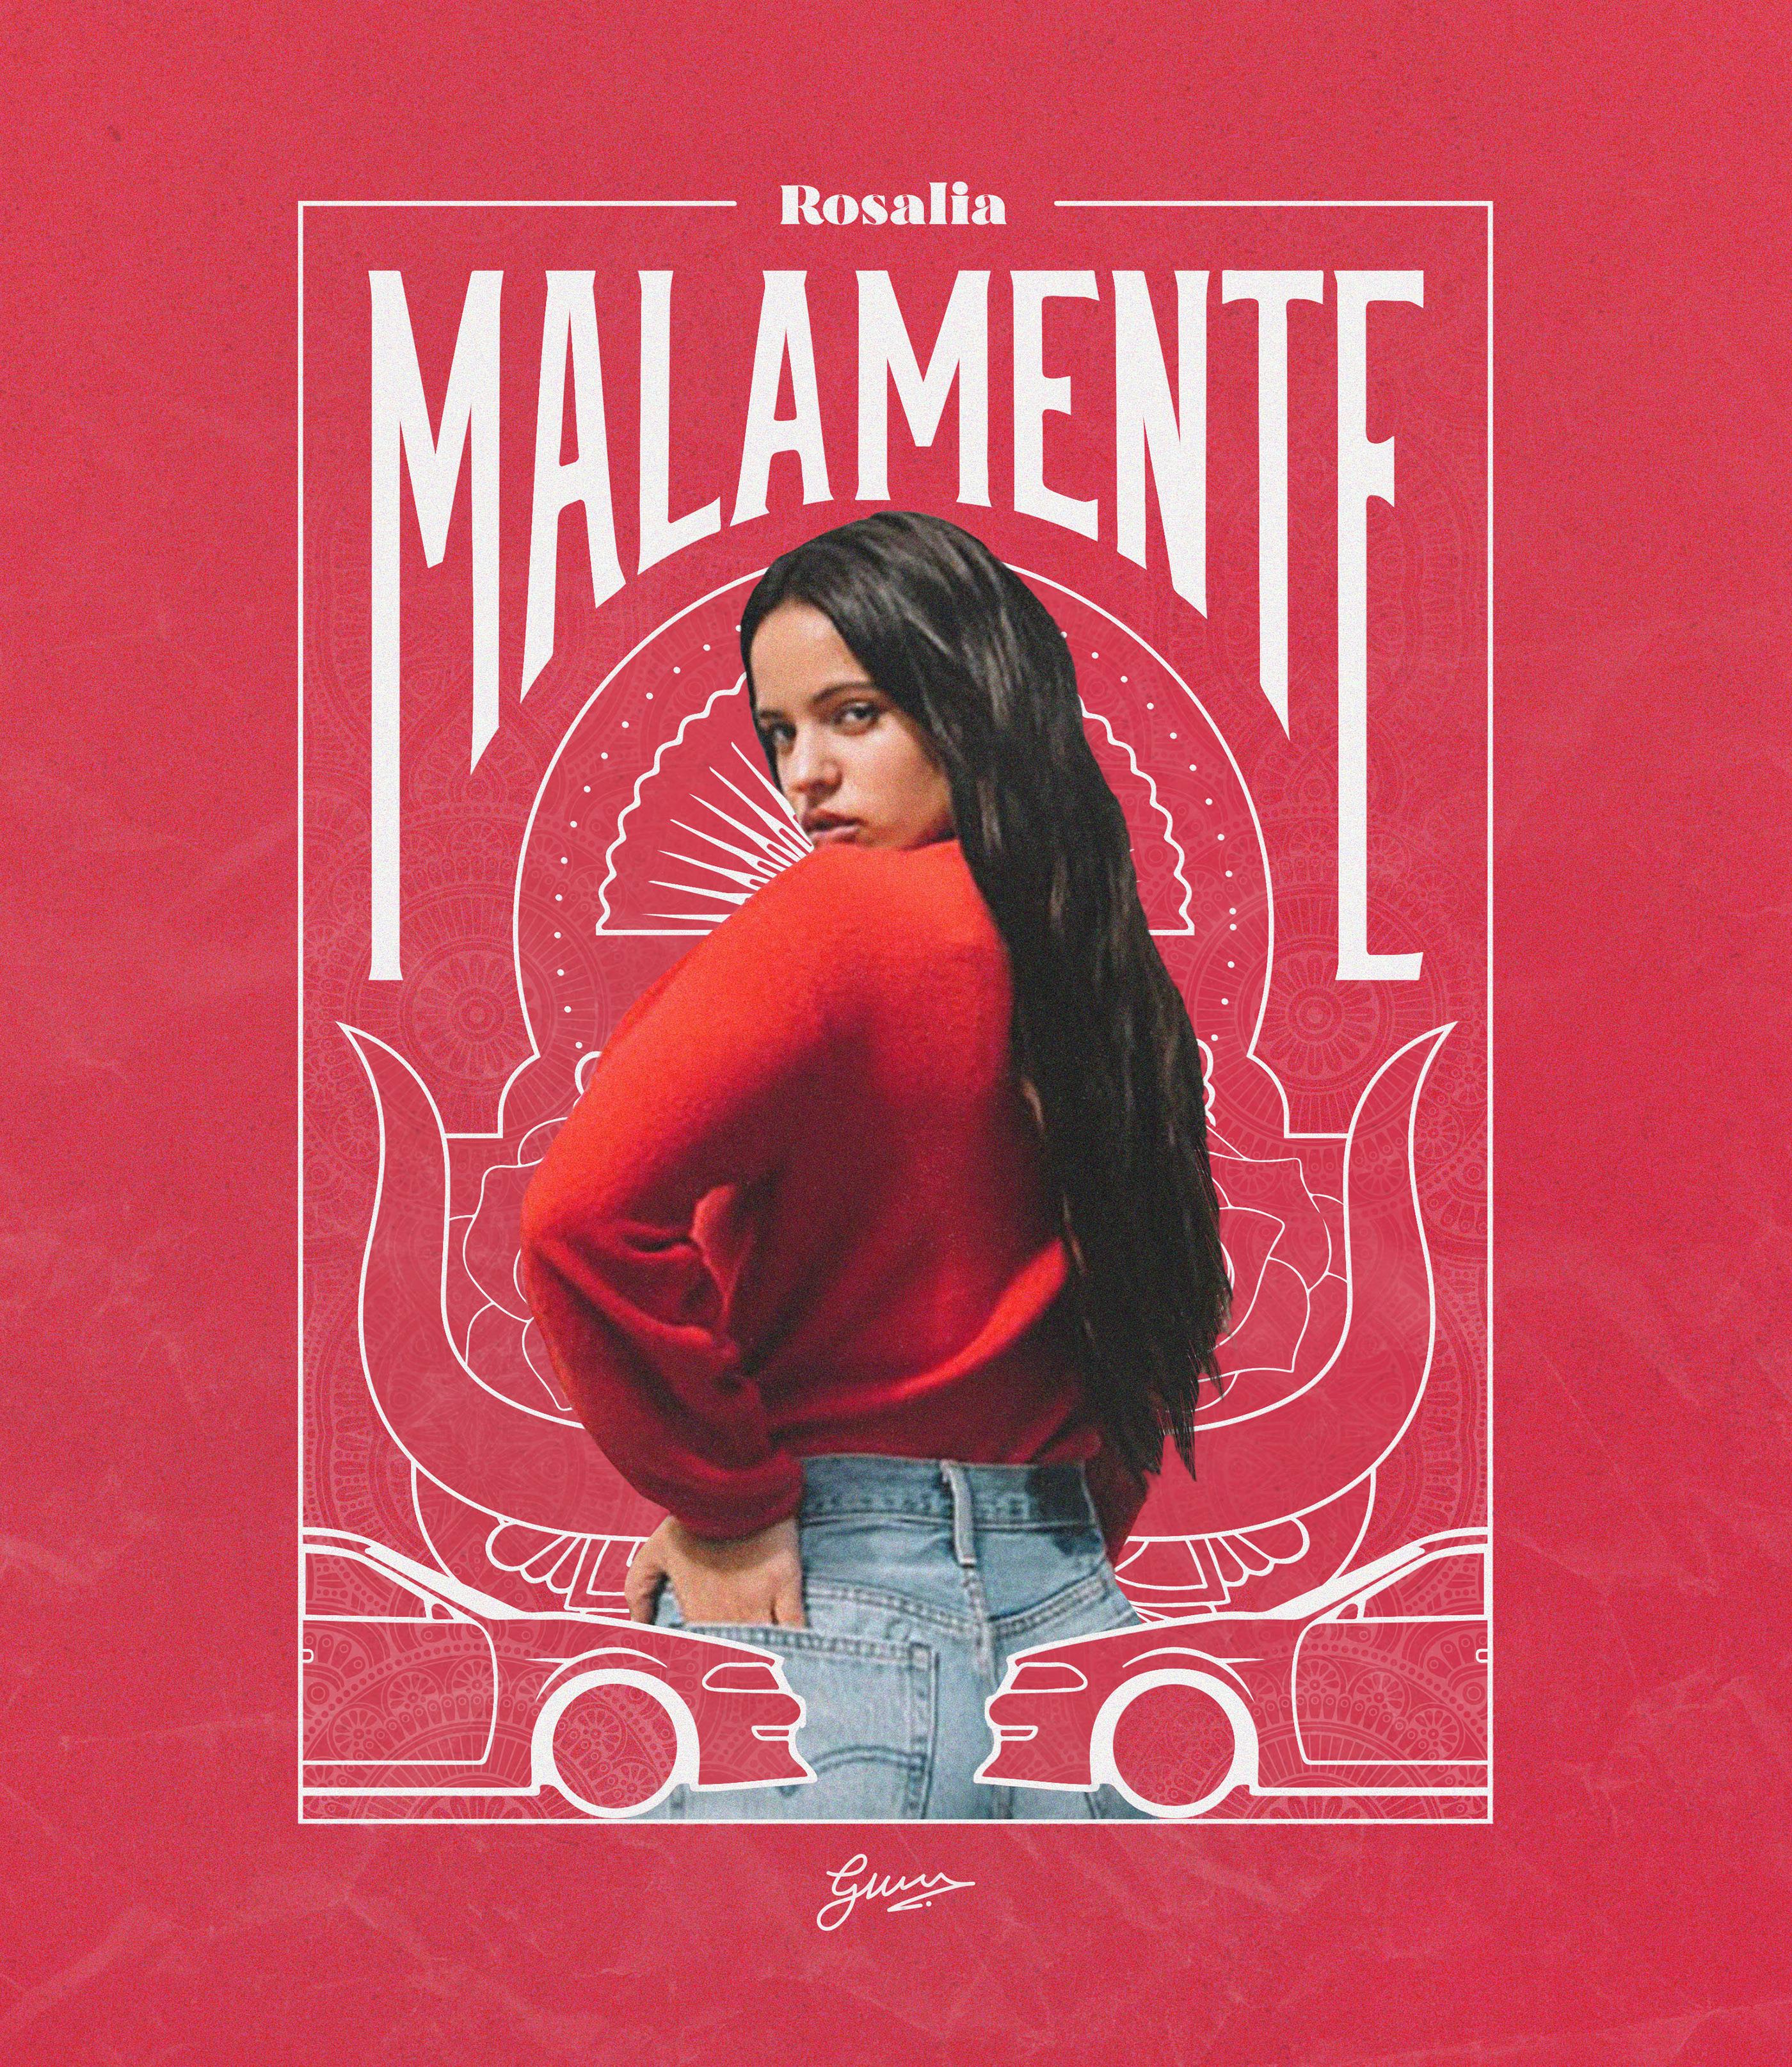 Rosalía: Malamente (Video 2018) - IMDb